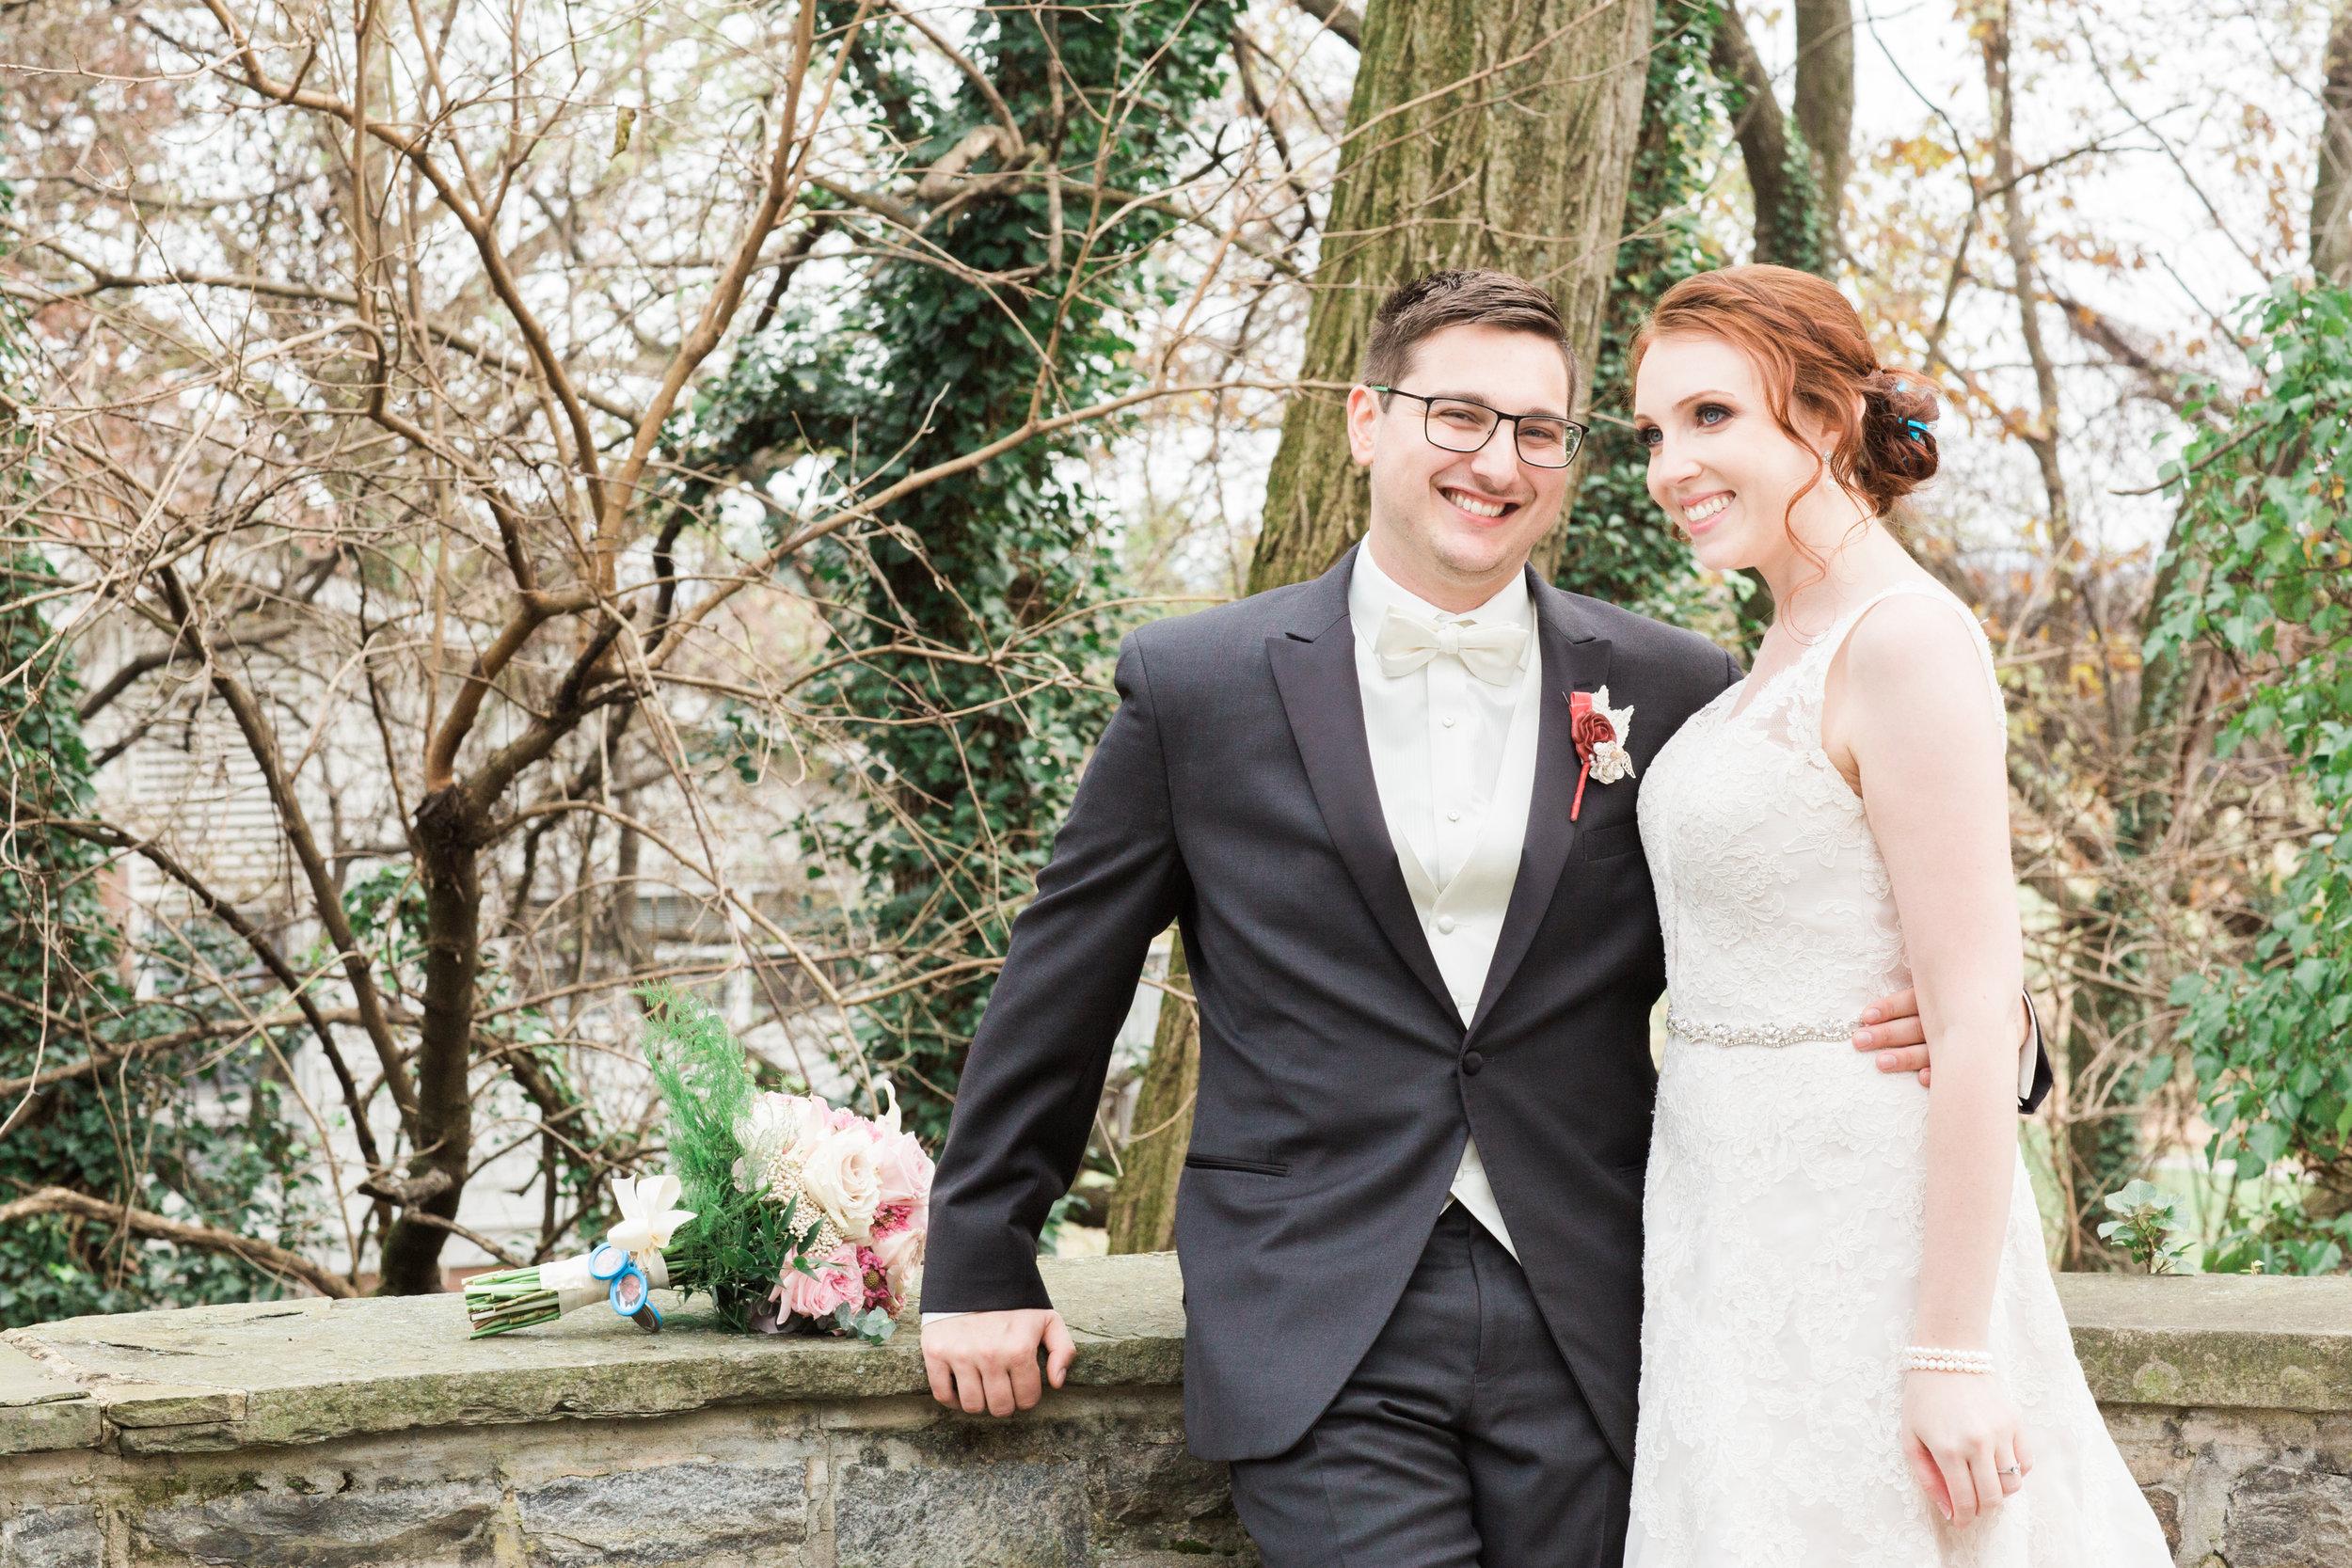 Harry Potter Wedding at Overhills Mansion Catonville Maryland Wedding Photographers Megapixels Media (47 of 134).jpg